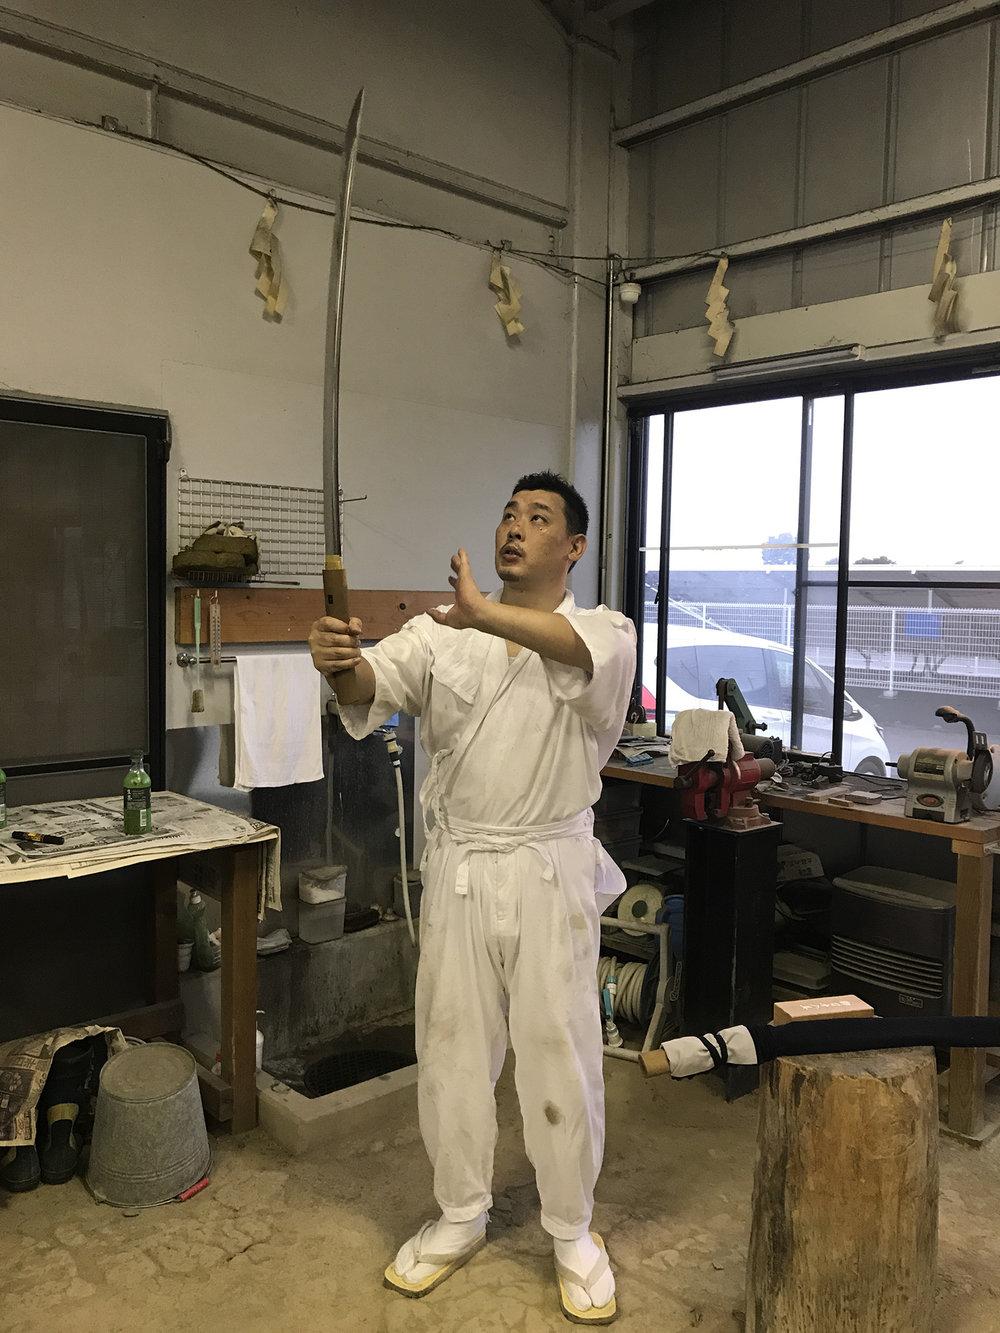 deeperjapan_tokyo_katana_shimojima_sword_customer_03.JPG